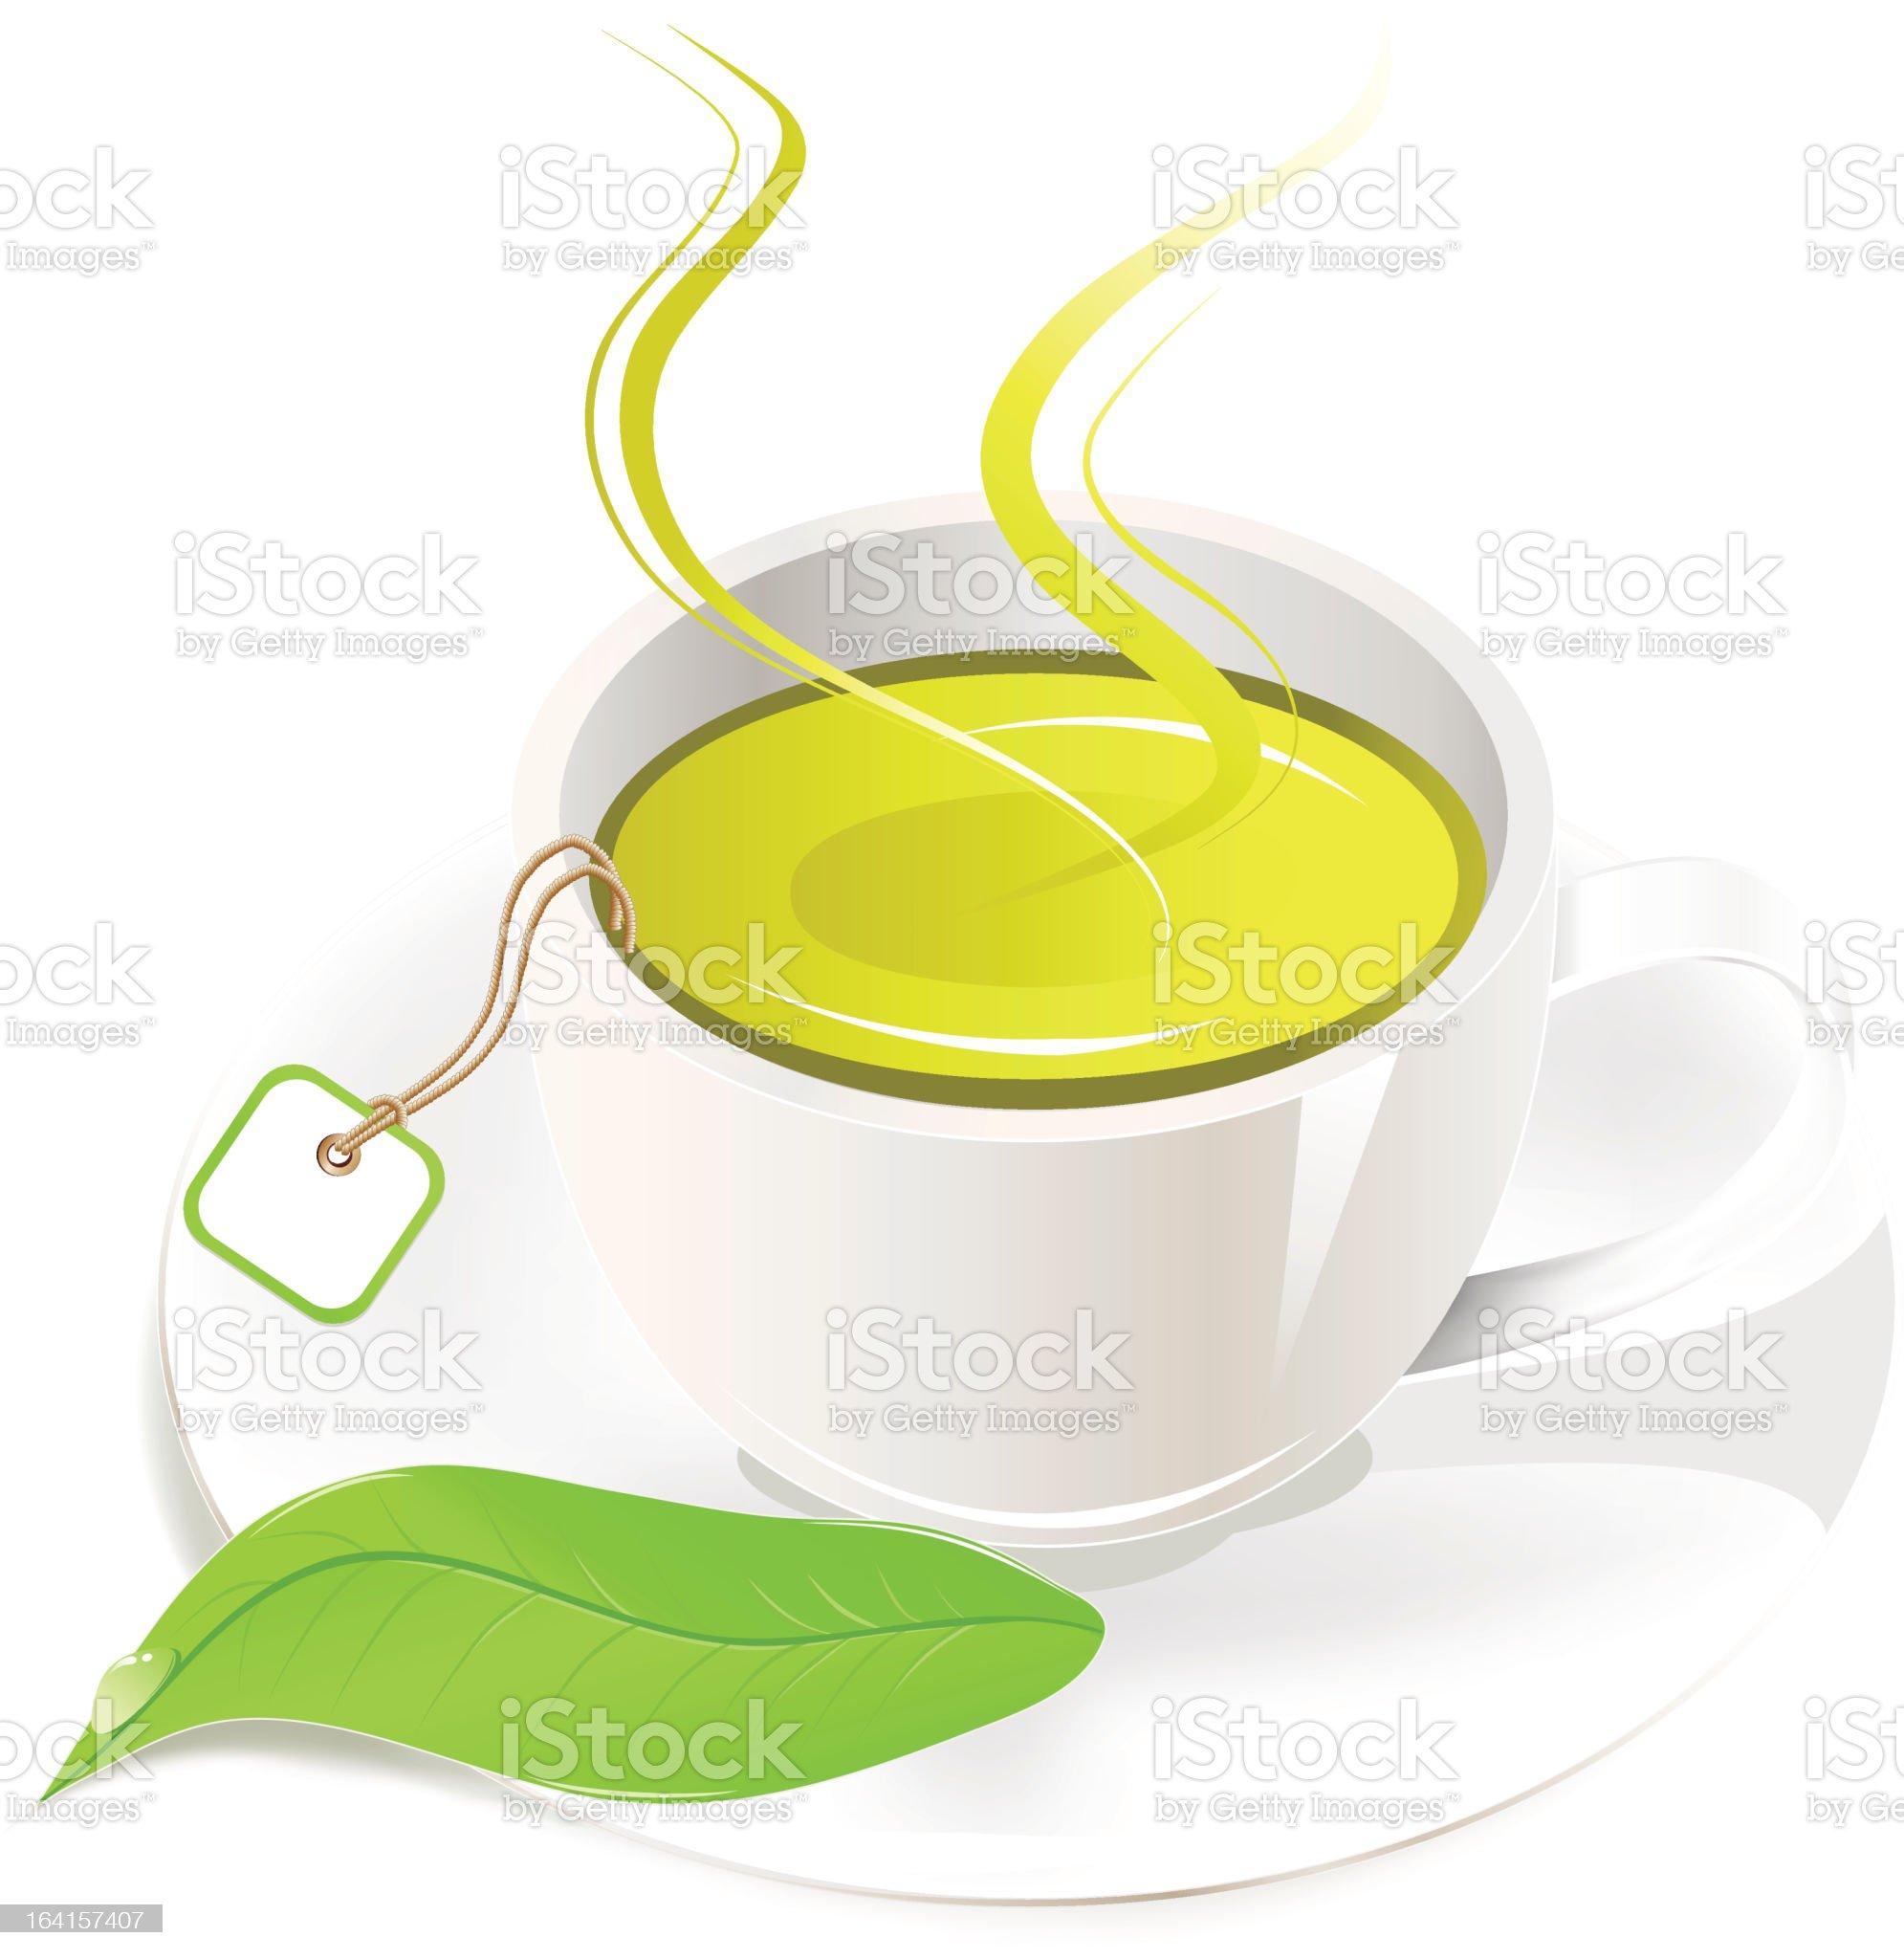 Tea cup royalty-free stock vector art